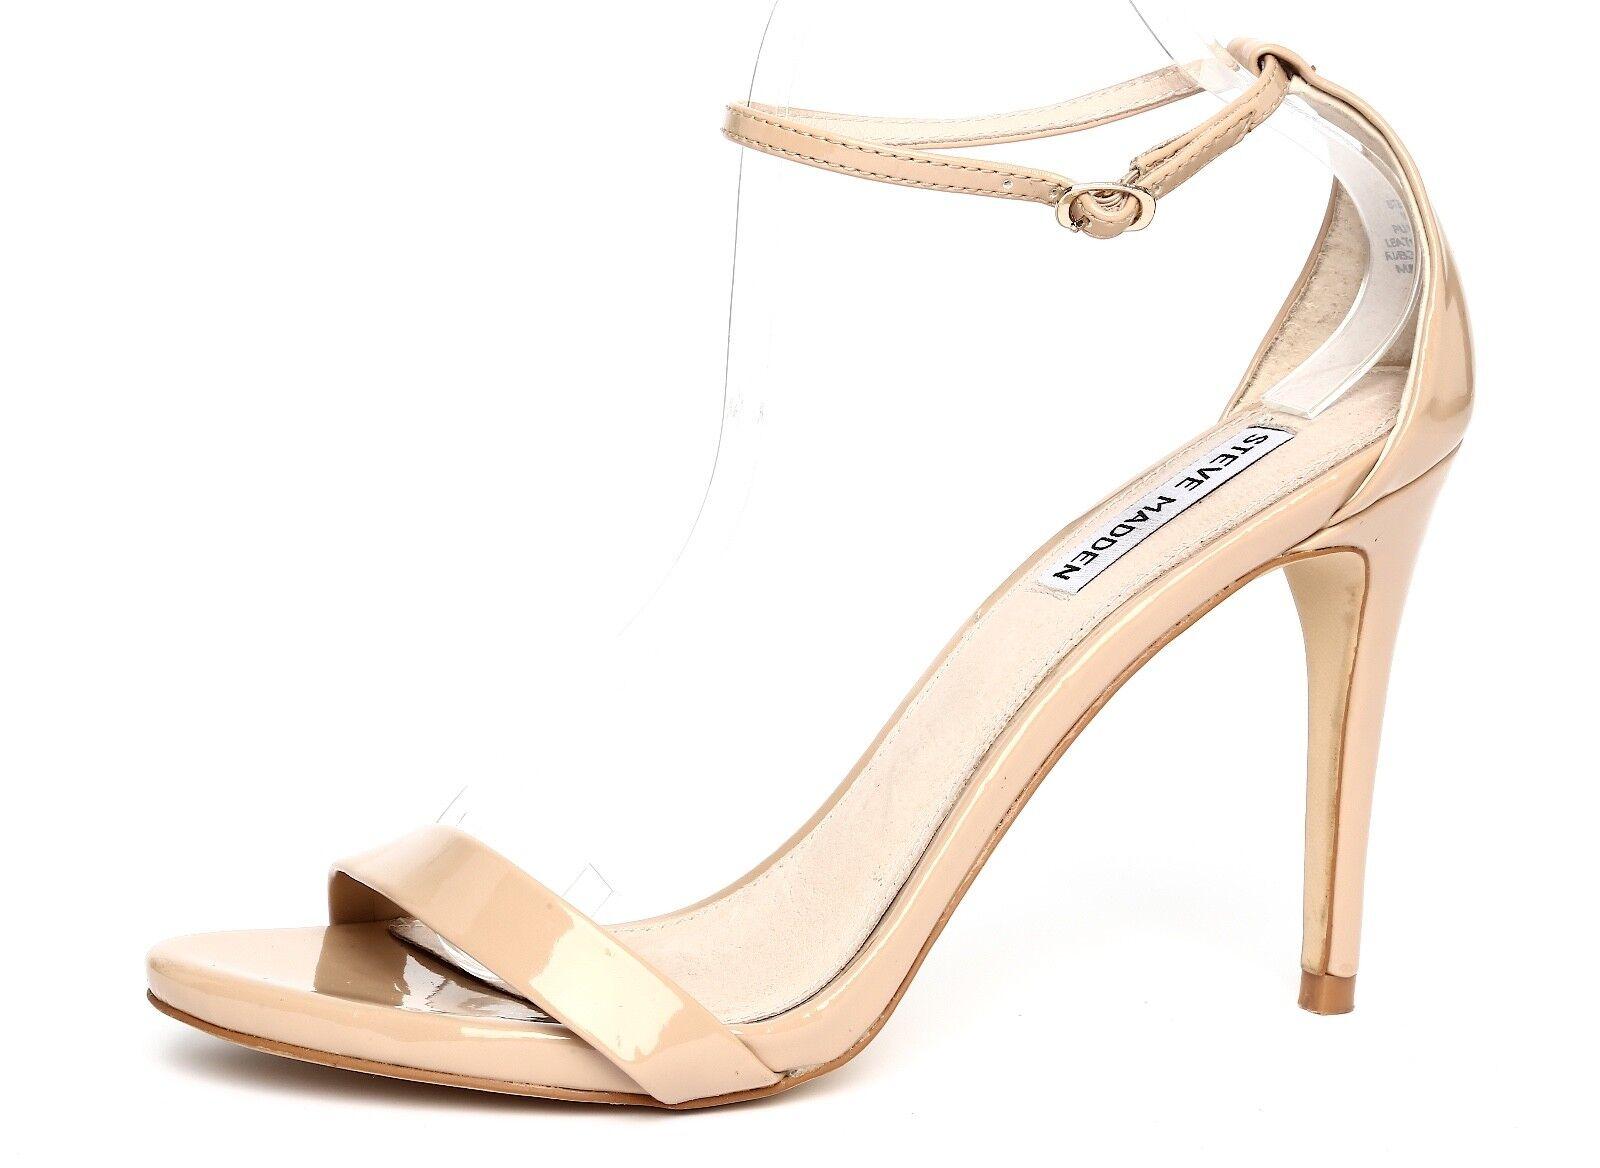 tutti i beni sono speciali Steve Madden Stecy Patent Leather Nude Ankle Strap Sandal Sandal Sandal Heels Sz 10M 1001  garanzia di credito